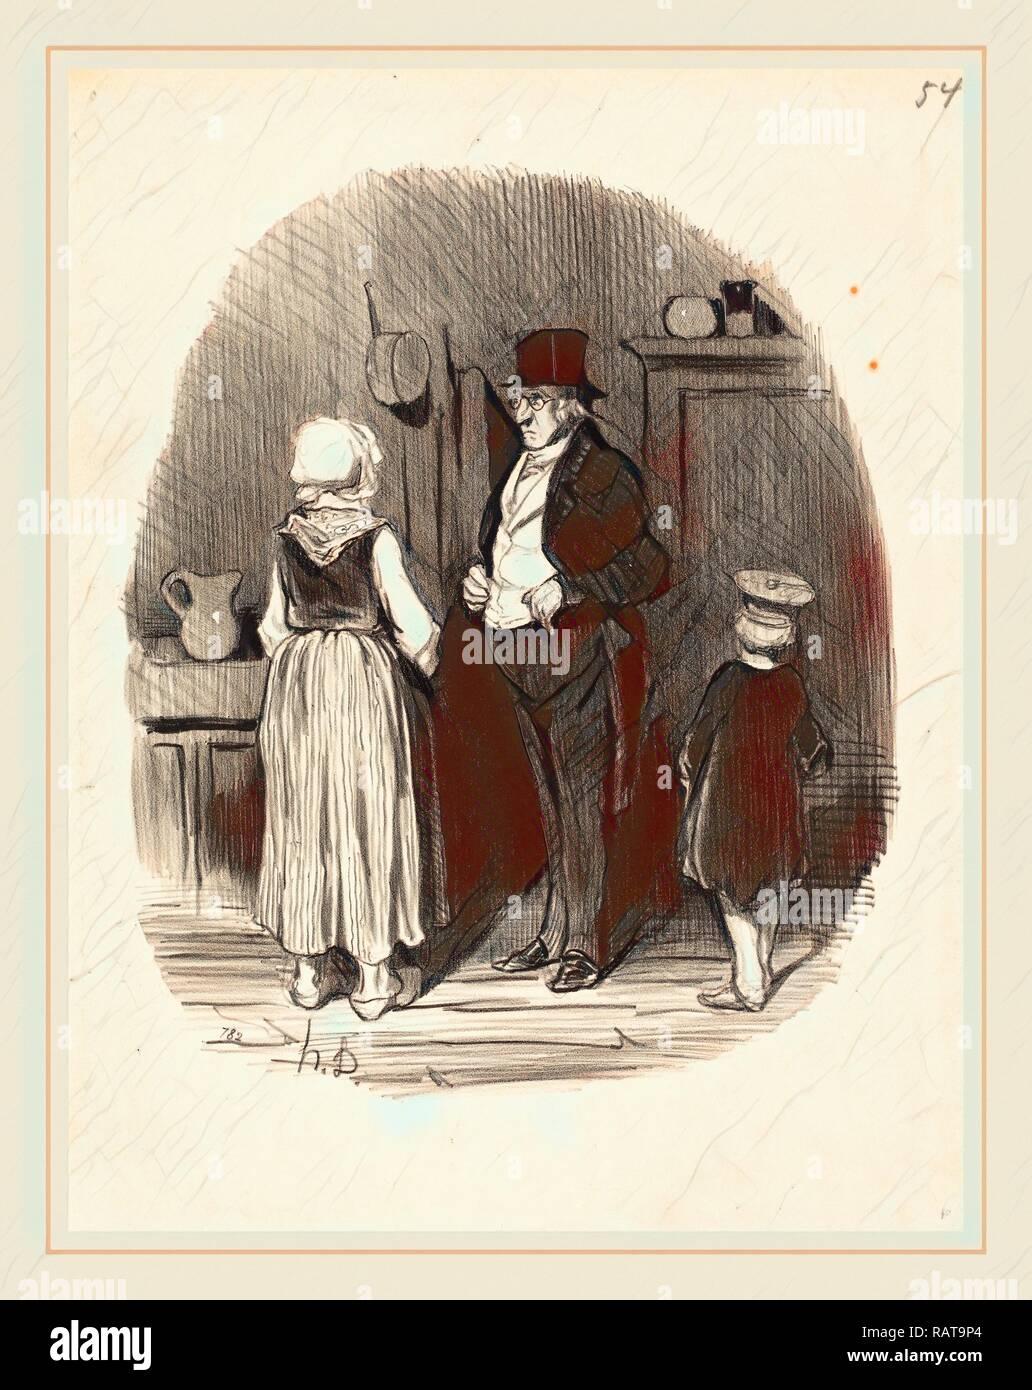 Honoré Daumier (French, 1808-1879), Comment! tous mes moutons sont morts, 1845, lithograph. Reimagined - Stock Image